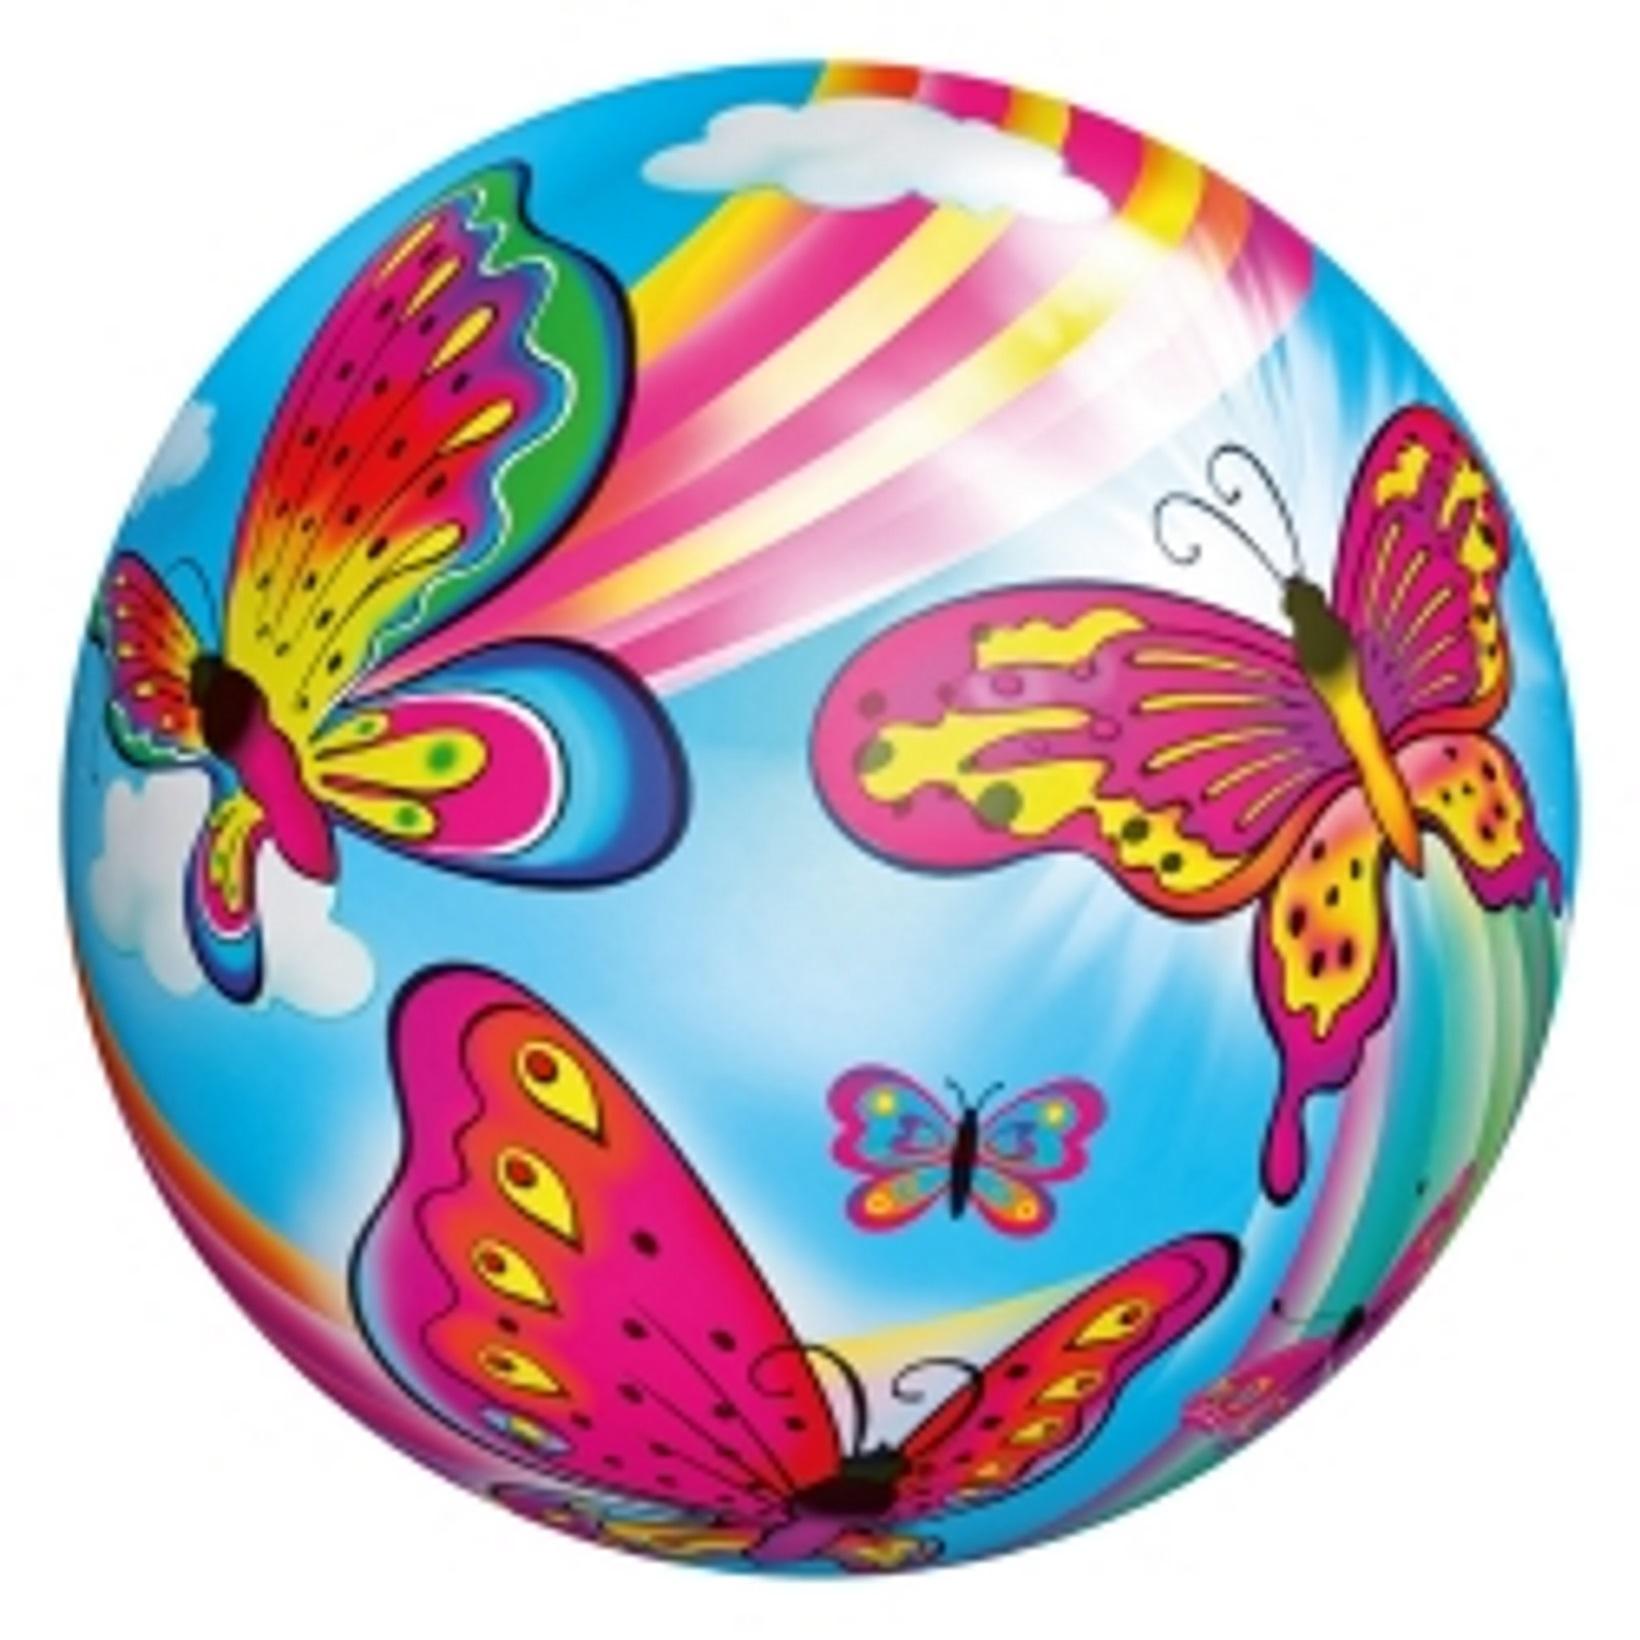 Schmetterling Buntball 11,5cm